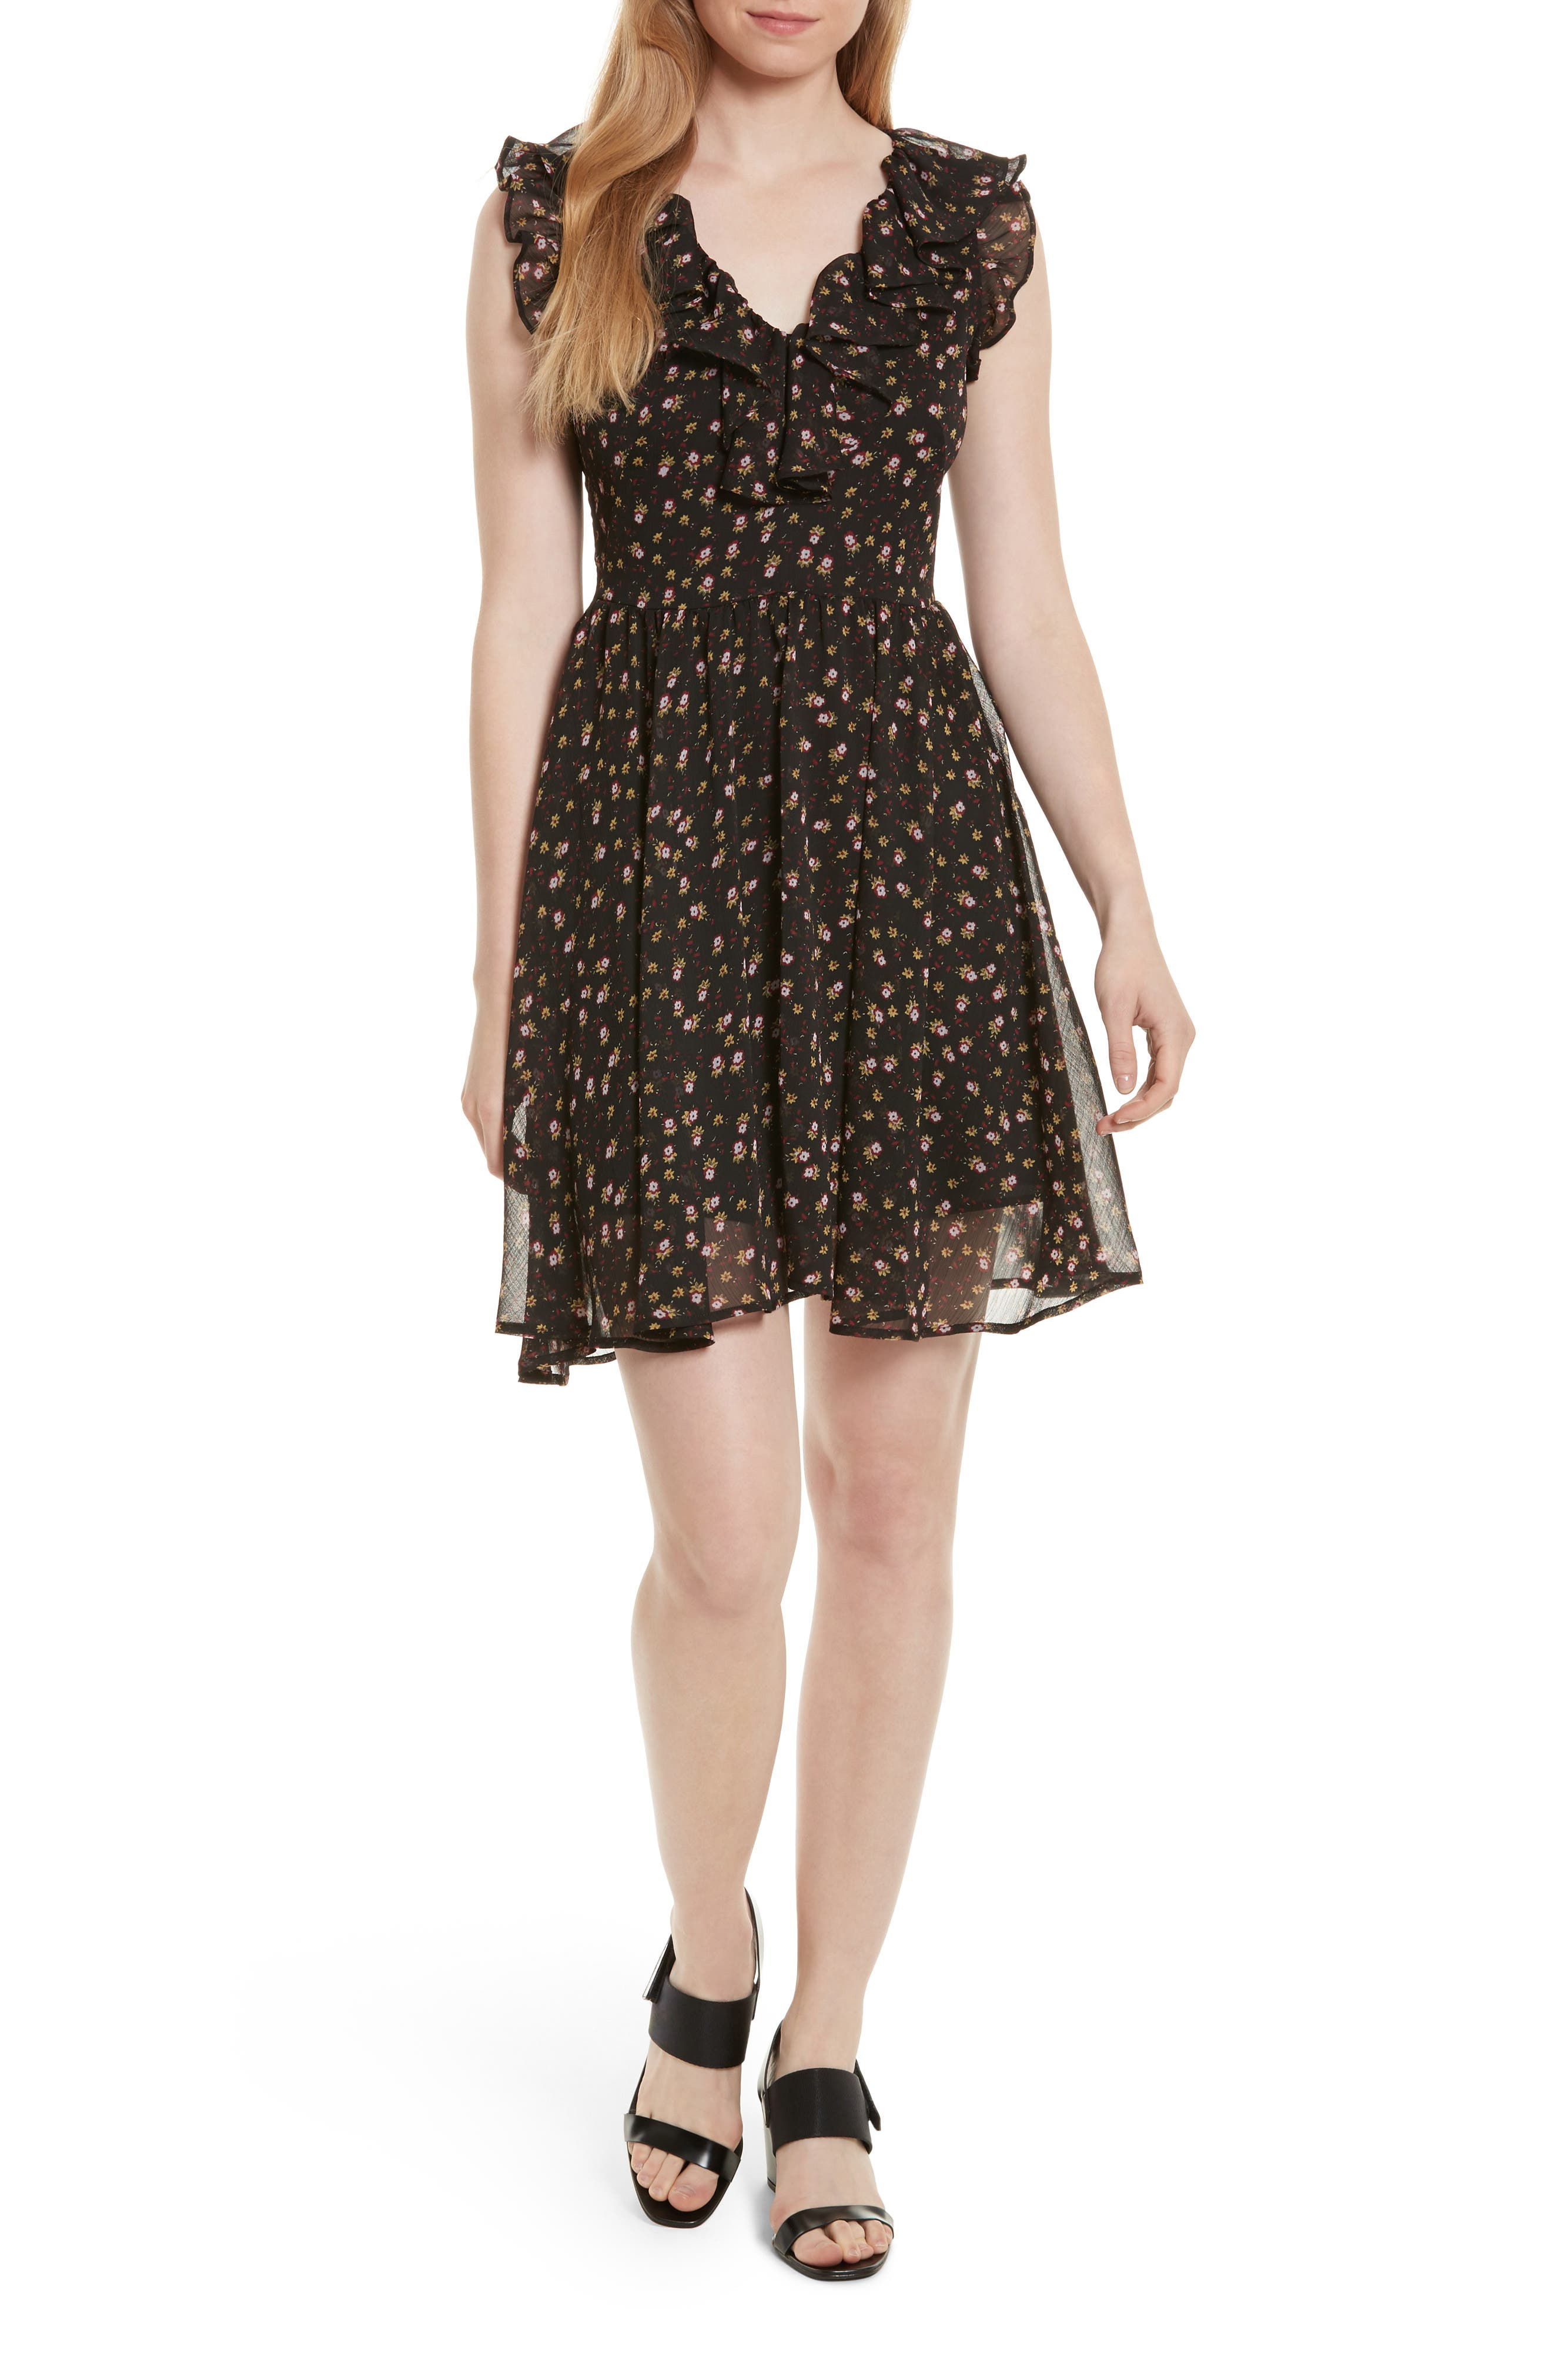 Alternate Image 1 Selected - Rebecca Minkoff Brista Fit & Flare Dress